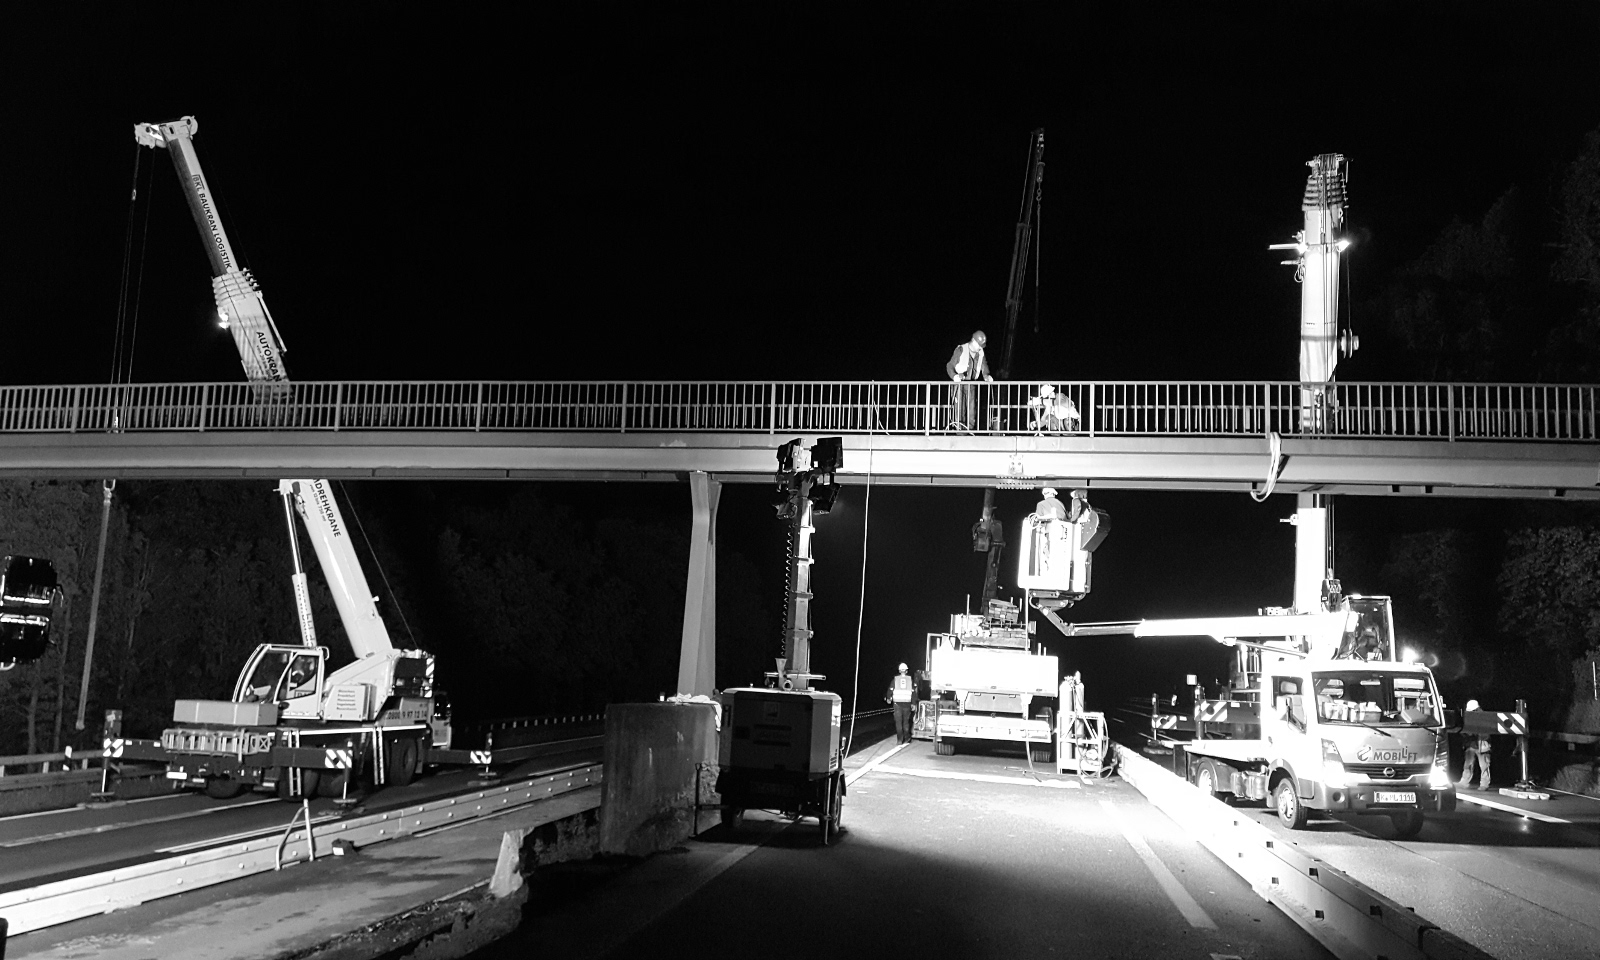 Demontage - A 5 Instandsetzung ÜF Gehwegbrücke bei Ockstadt und ÜF Gehwegbrücke bei Ober-Rosbach